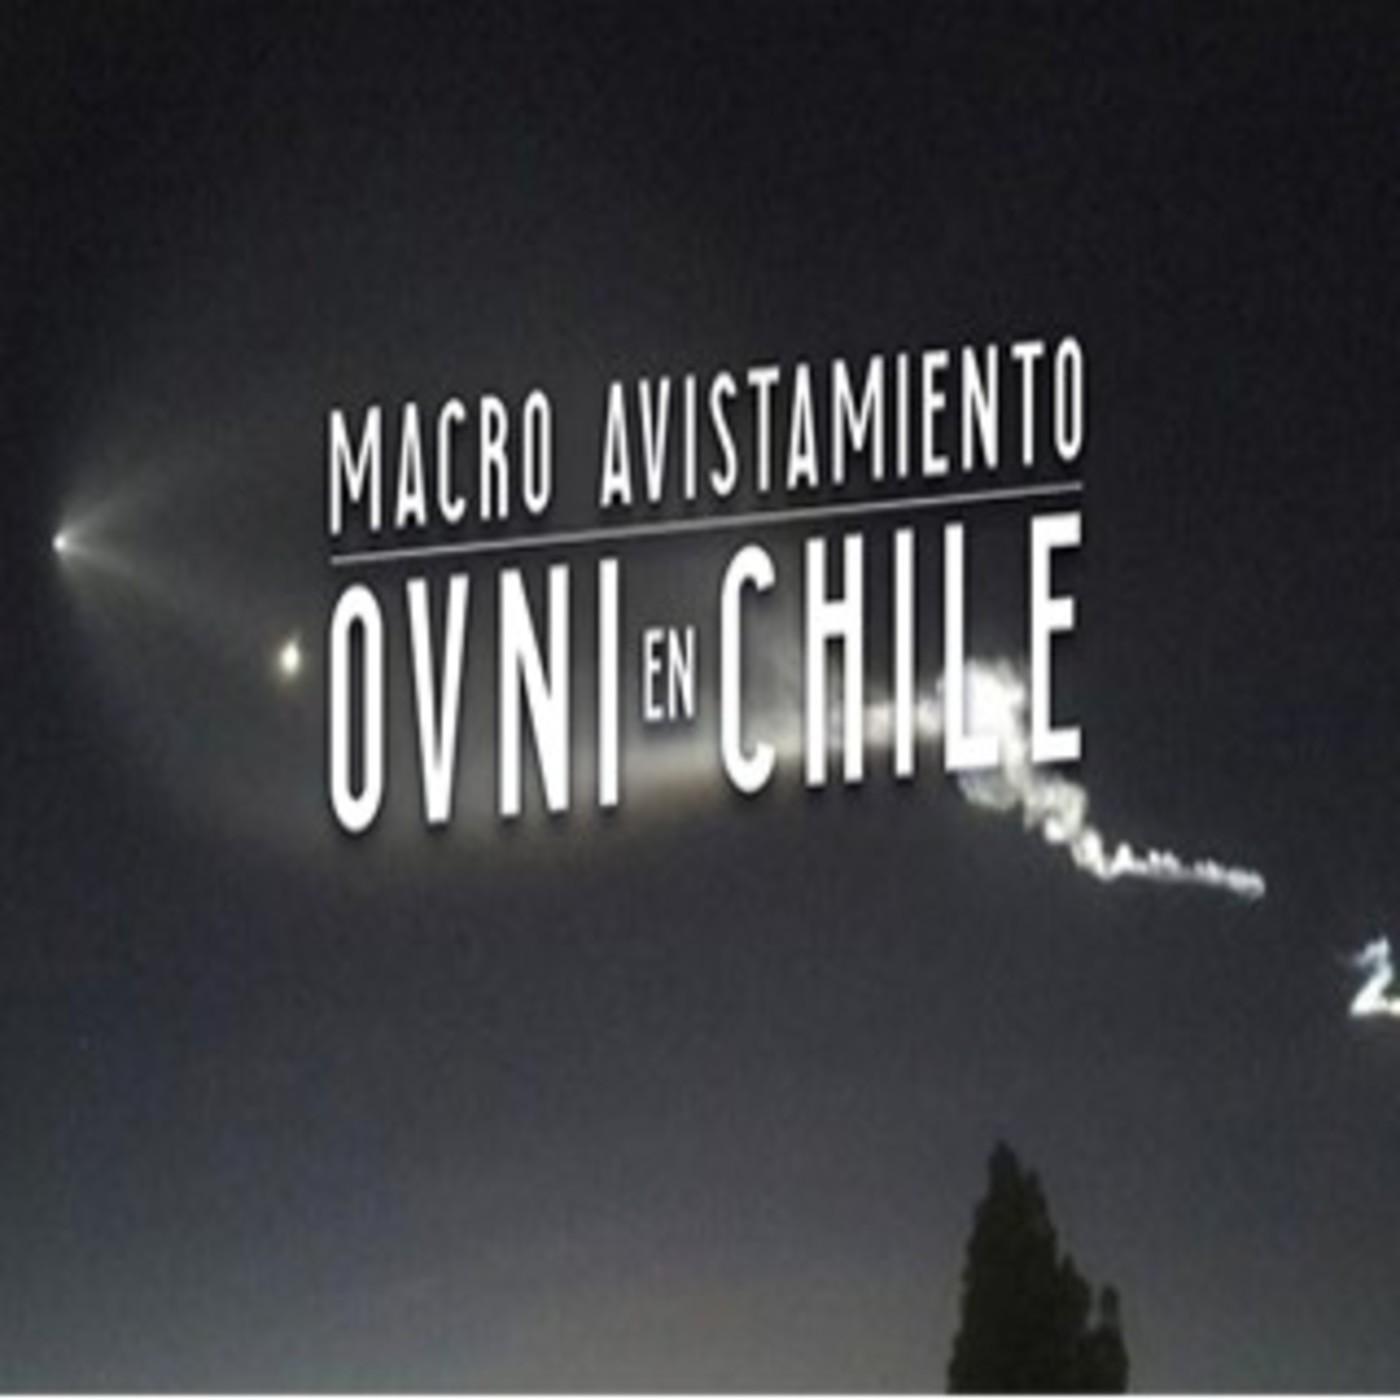 Cuarto milenio: Macro avistamiento OVNI en Chile en Cuarto Milenio ...